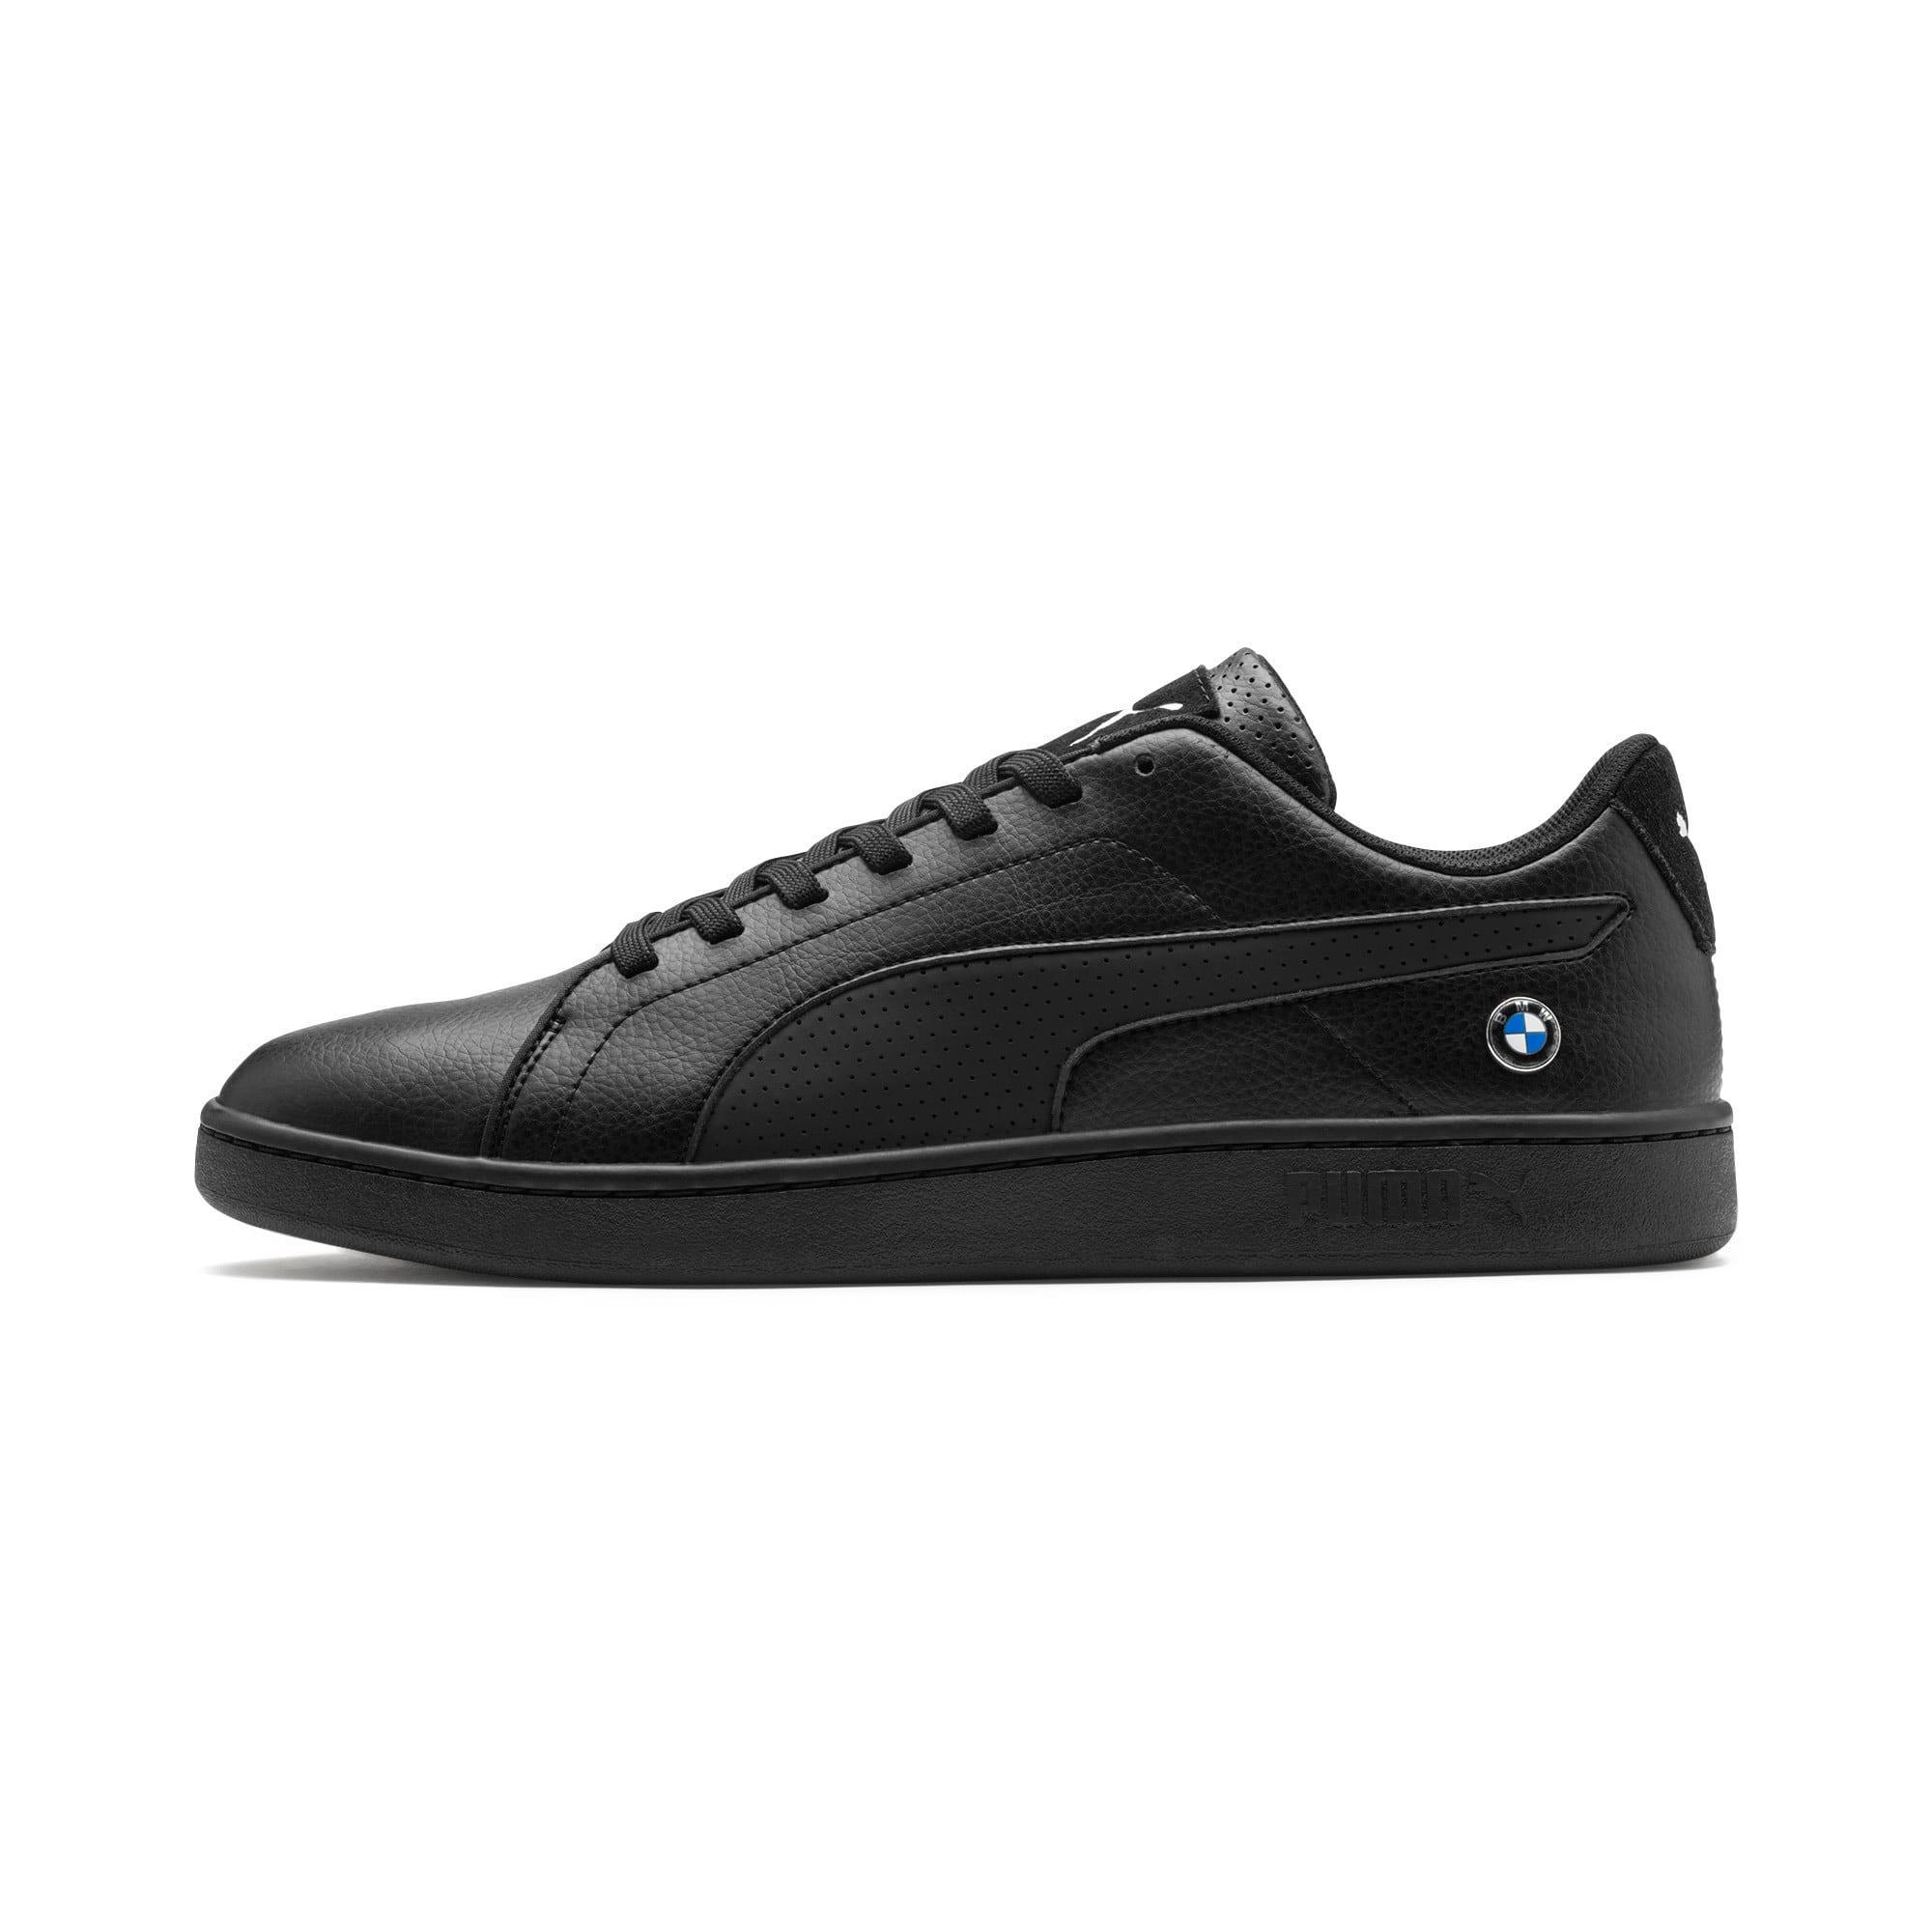 Thumbnail 1 of BMW M Motorsport Smash v2 Sneakers, Puma Black-Puma Black, medium